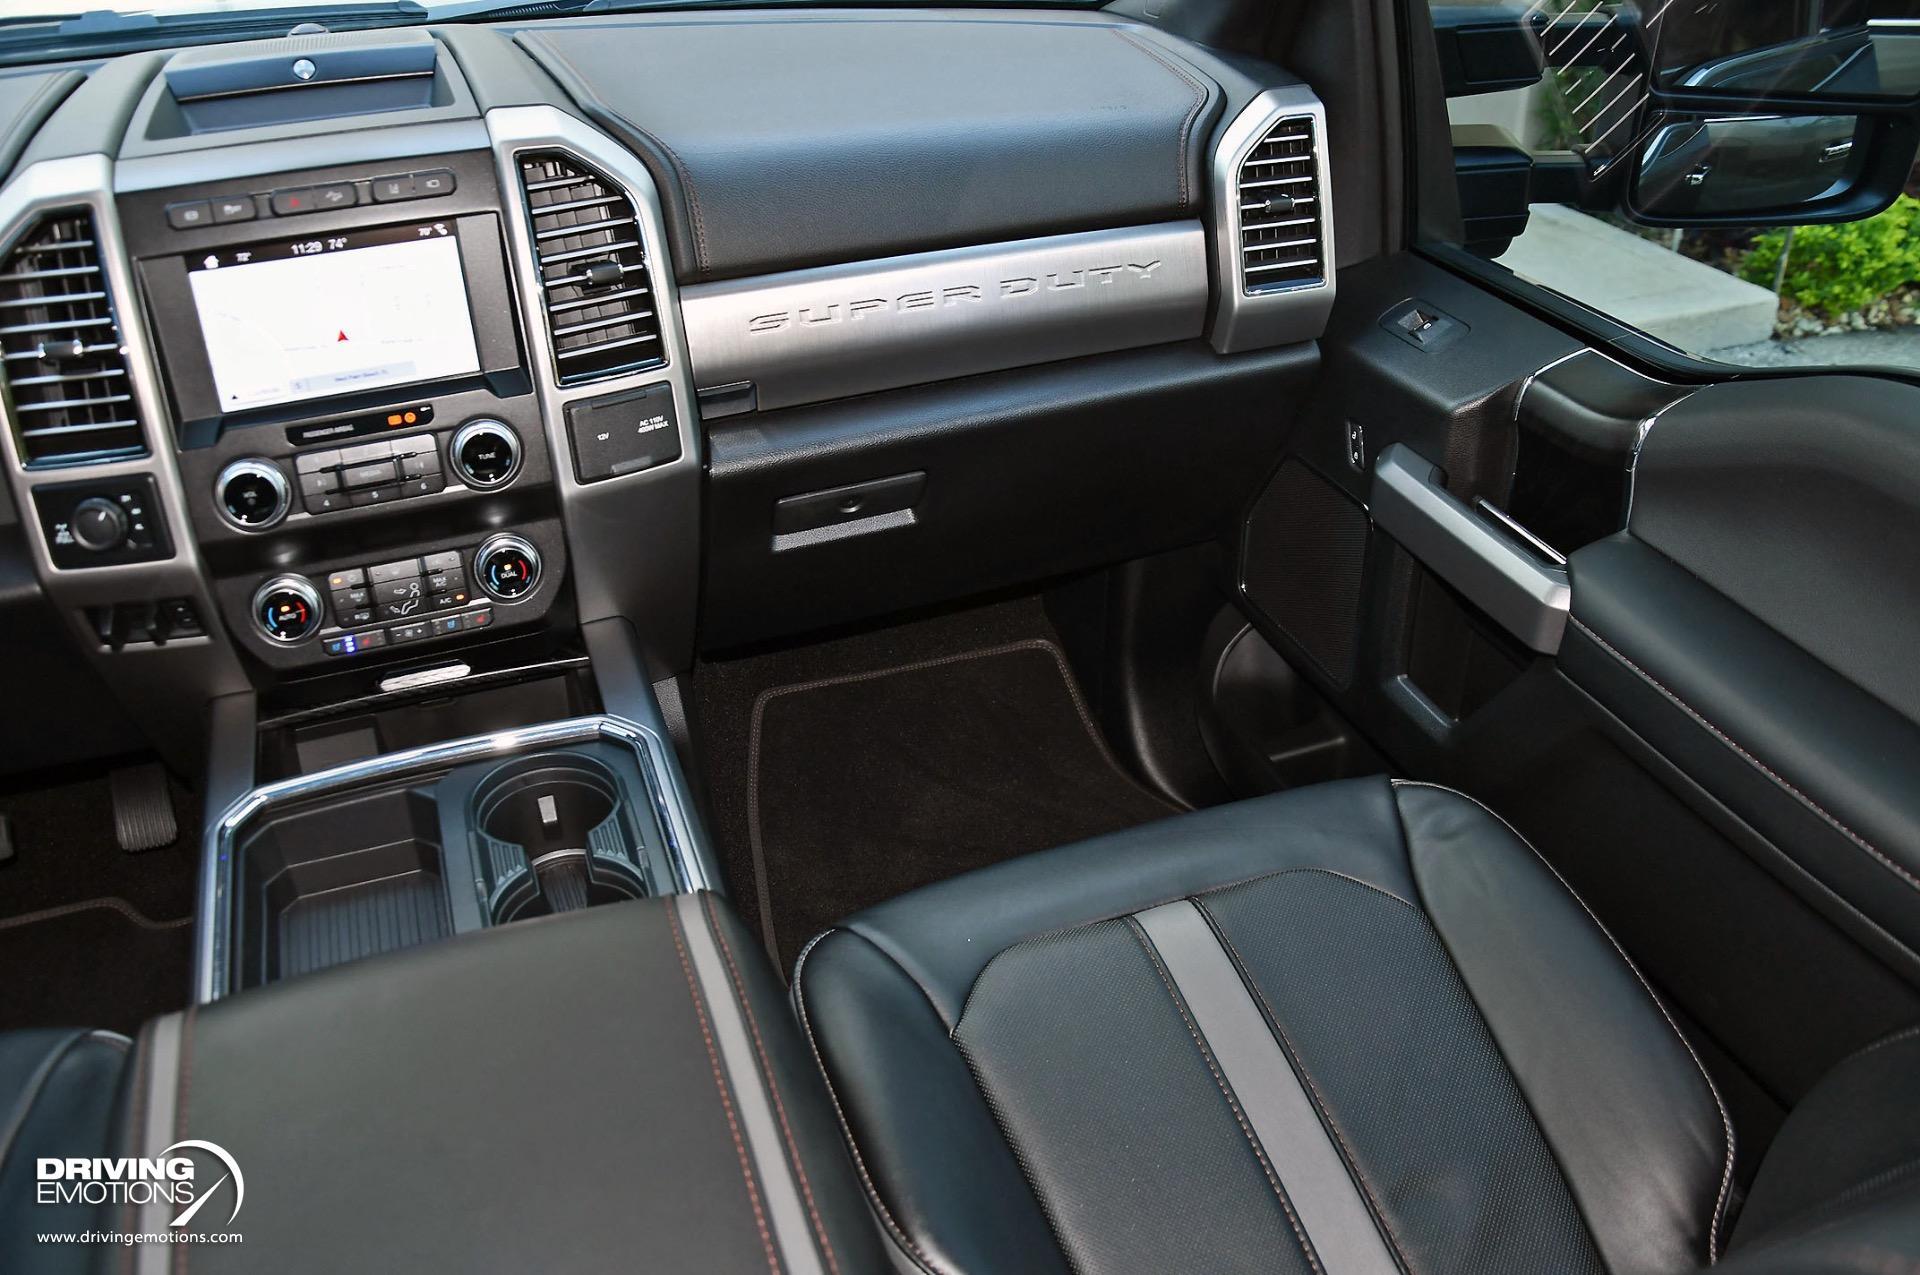 Used 2019 Ford F-350 Super Duty Platinum 4X4 Crew Cab 6.7L Power Stroke V8 Diesel | Lake Park, FL